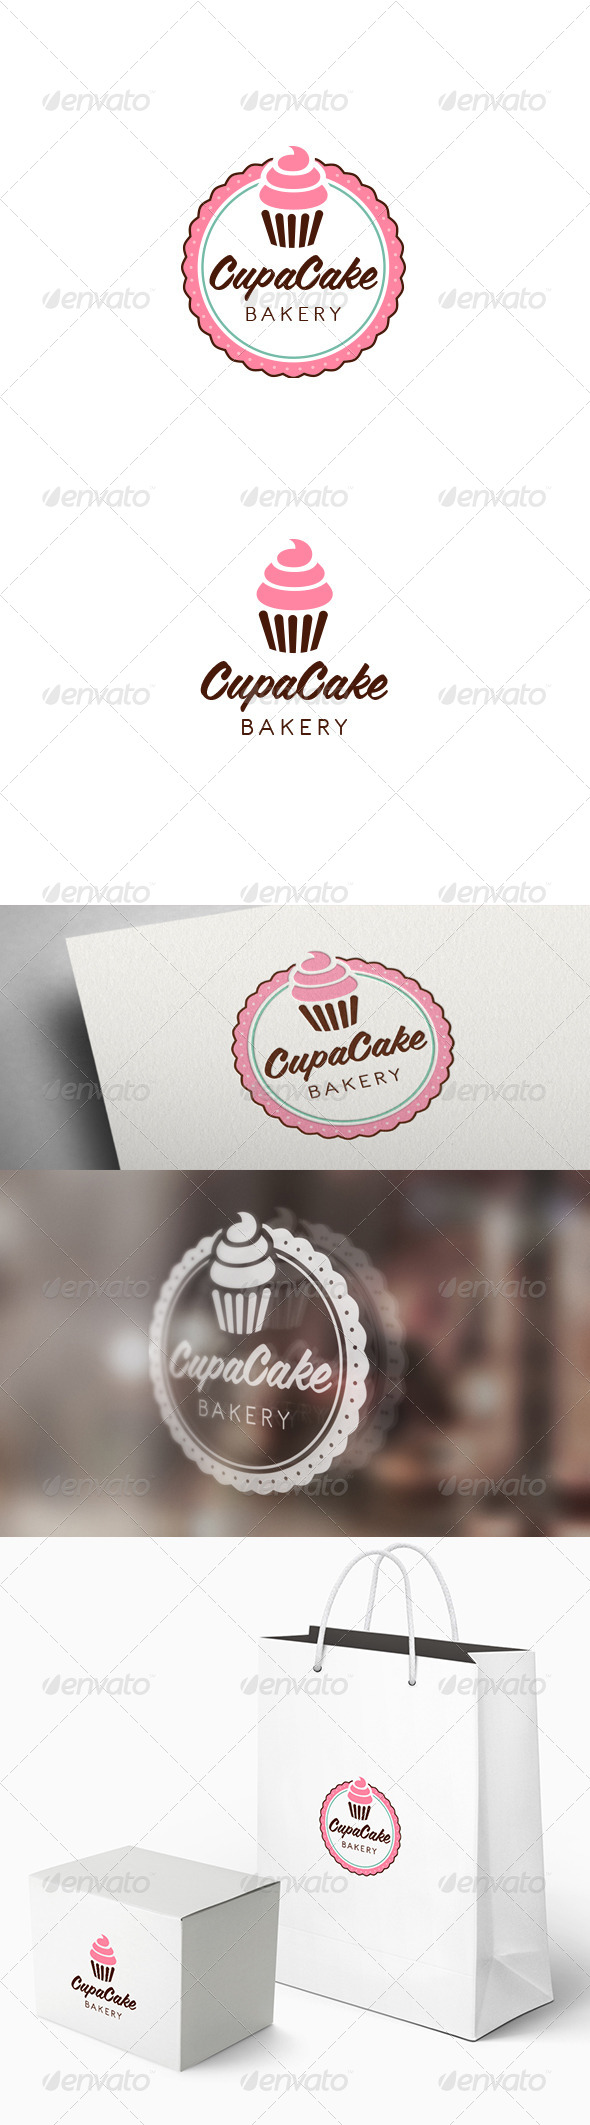 GraphicRiver Cupacake Logo Template 7617099